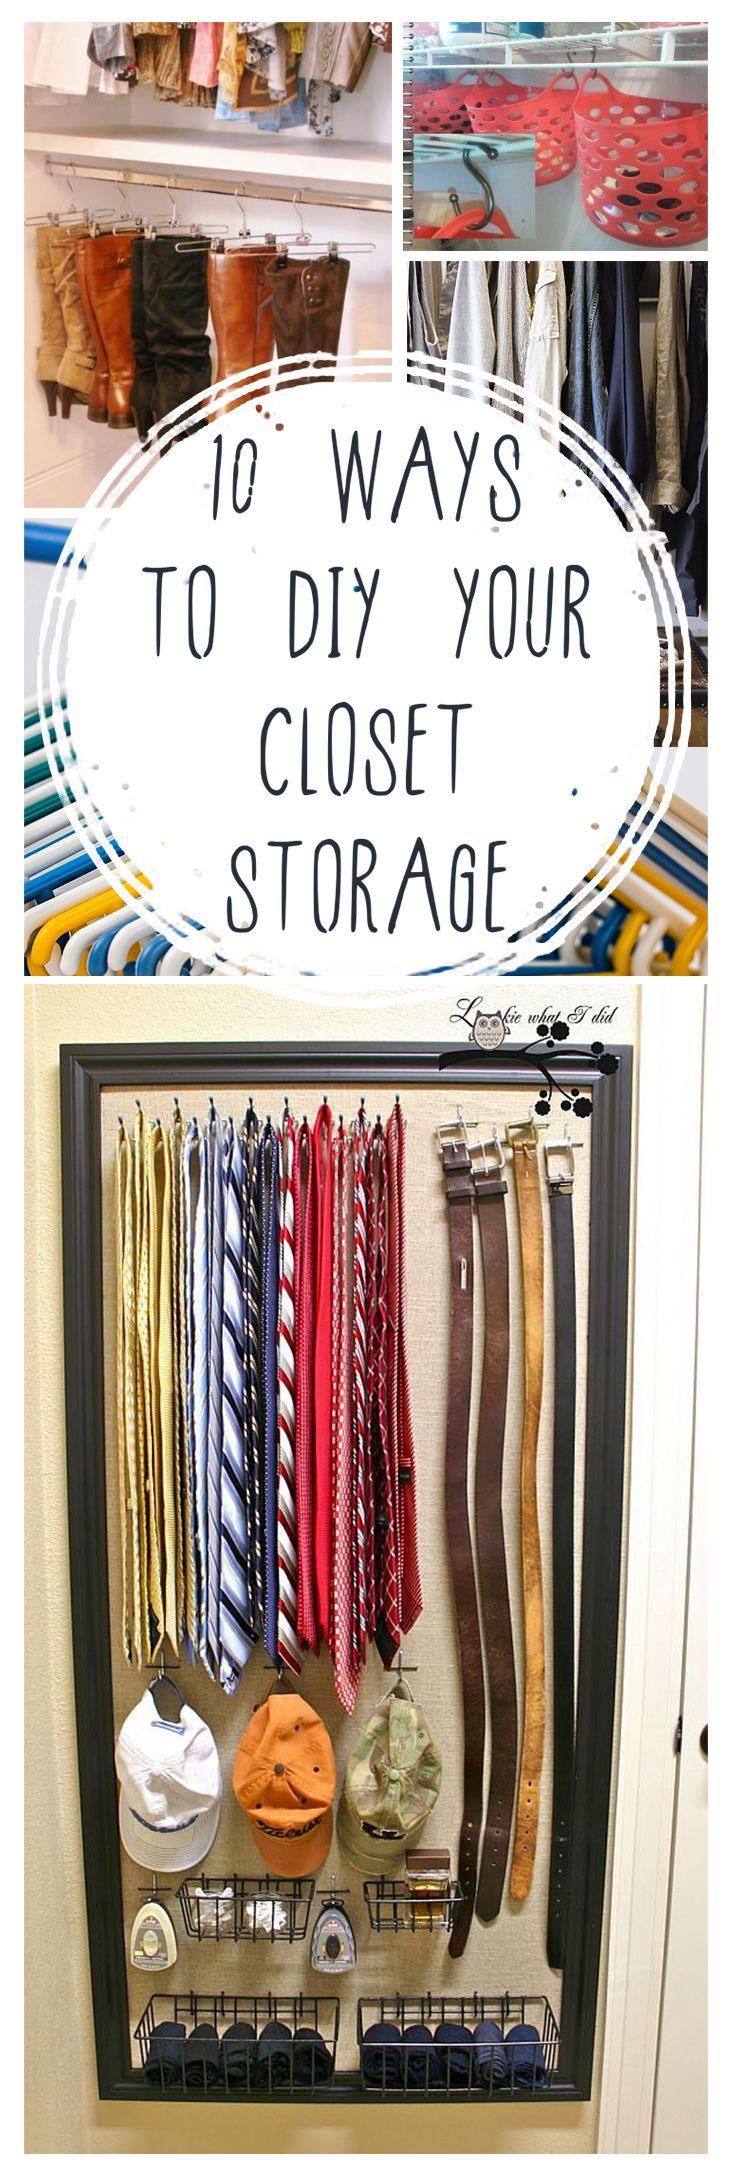 Closet storage, easy closet storage, closet organization, popular pin, DIY organization, organized home, home organization, get organized, stay organized.